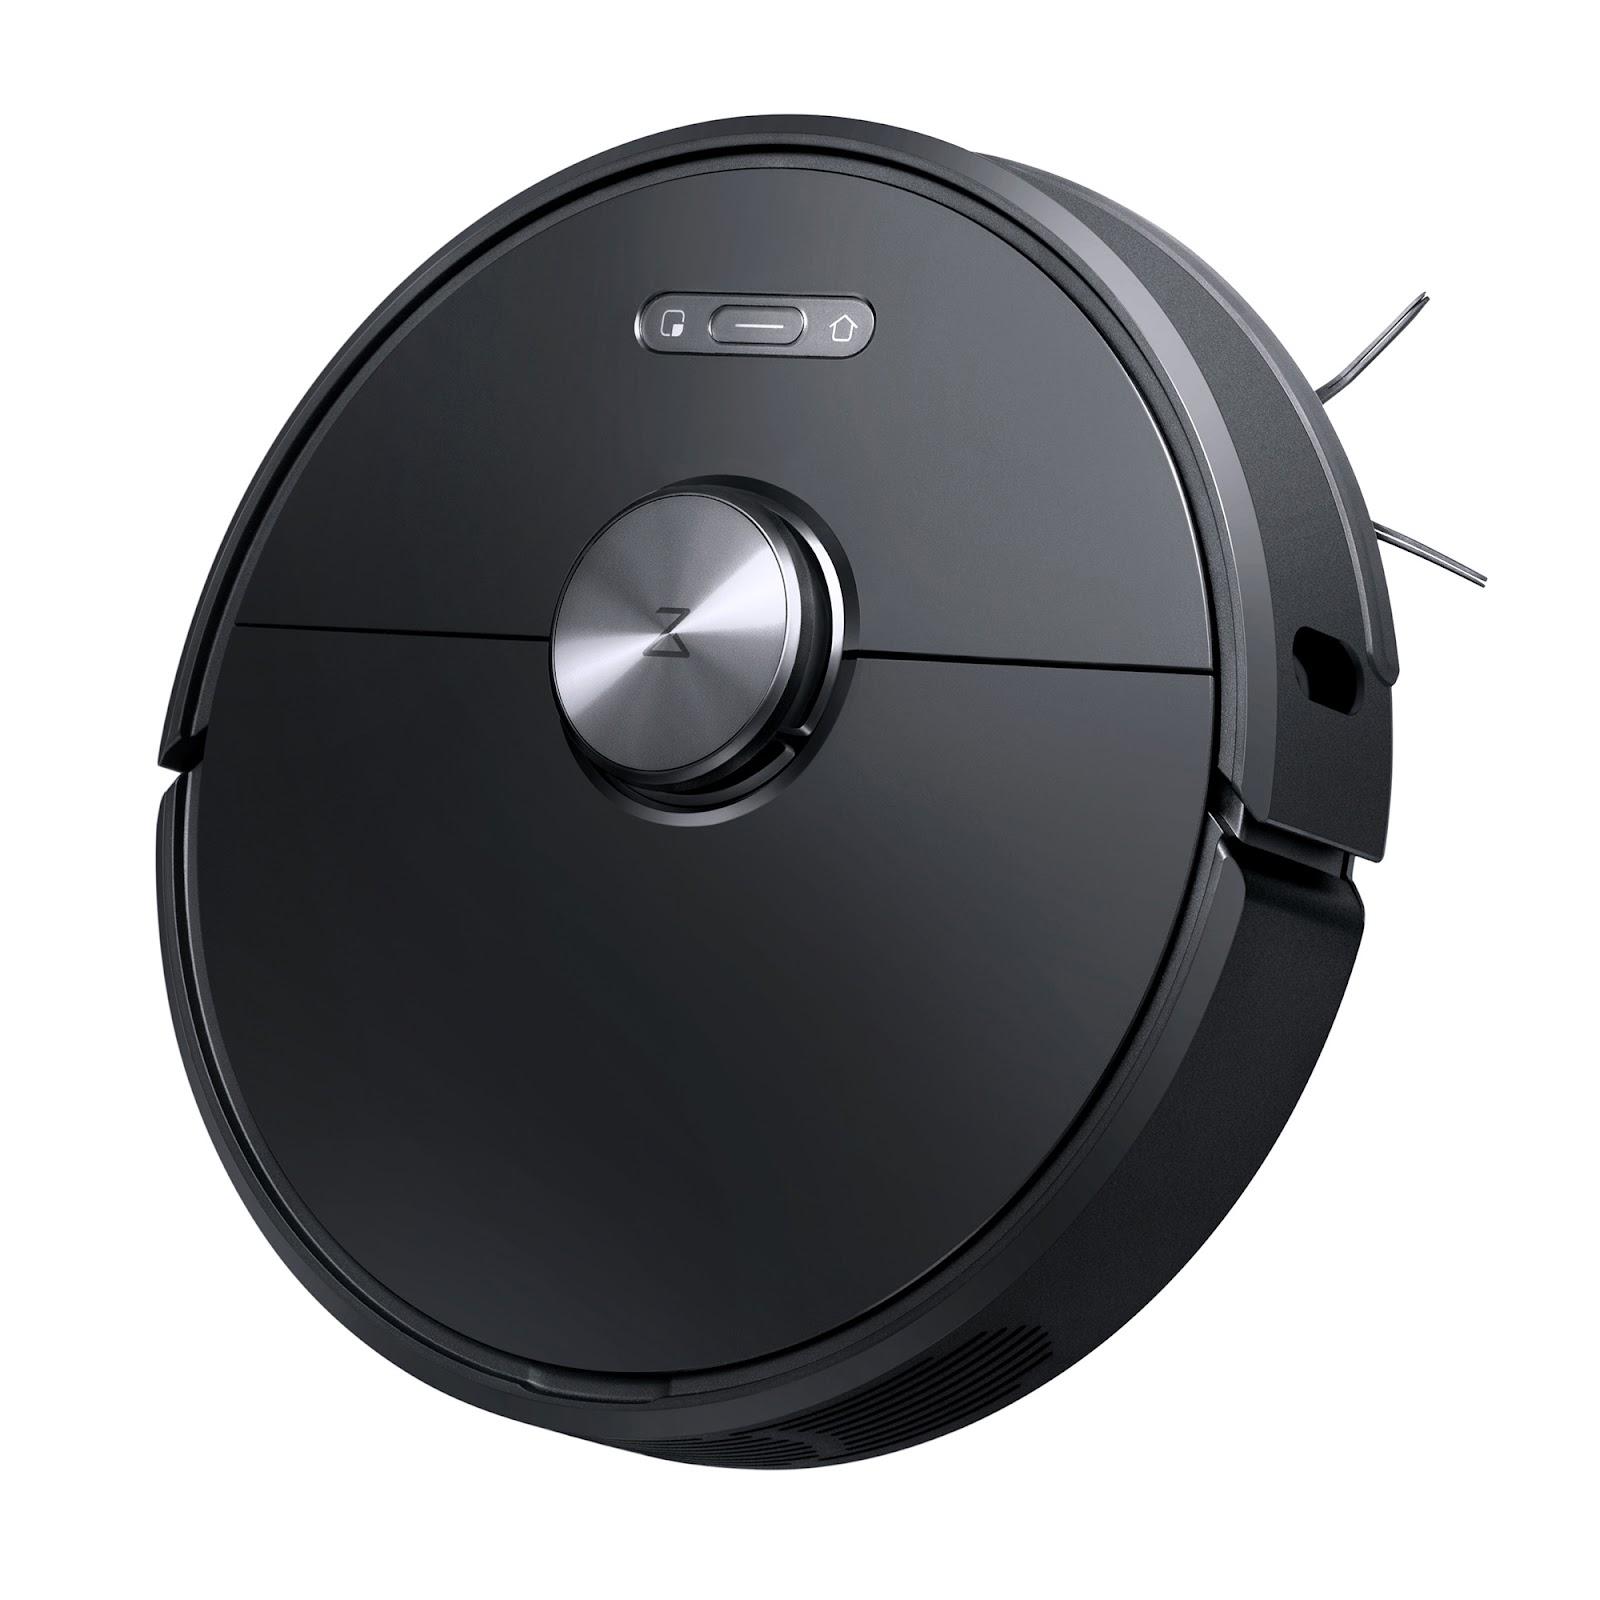 Roborock's versatile smart vacuum lineup is on sale during the Prime Days 5